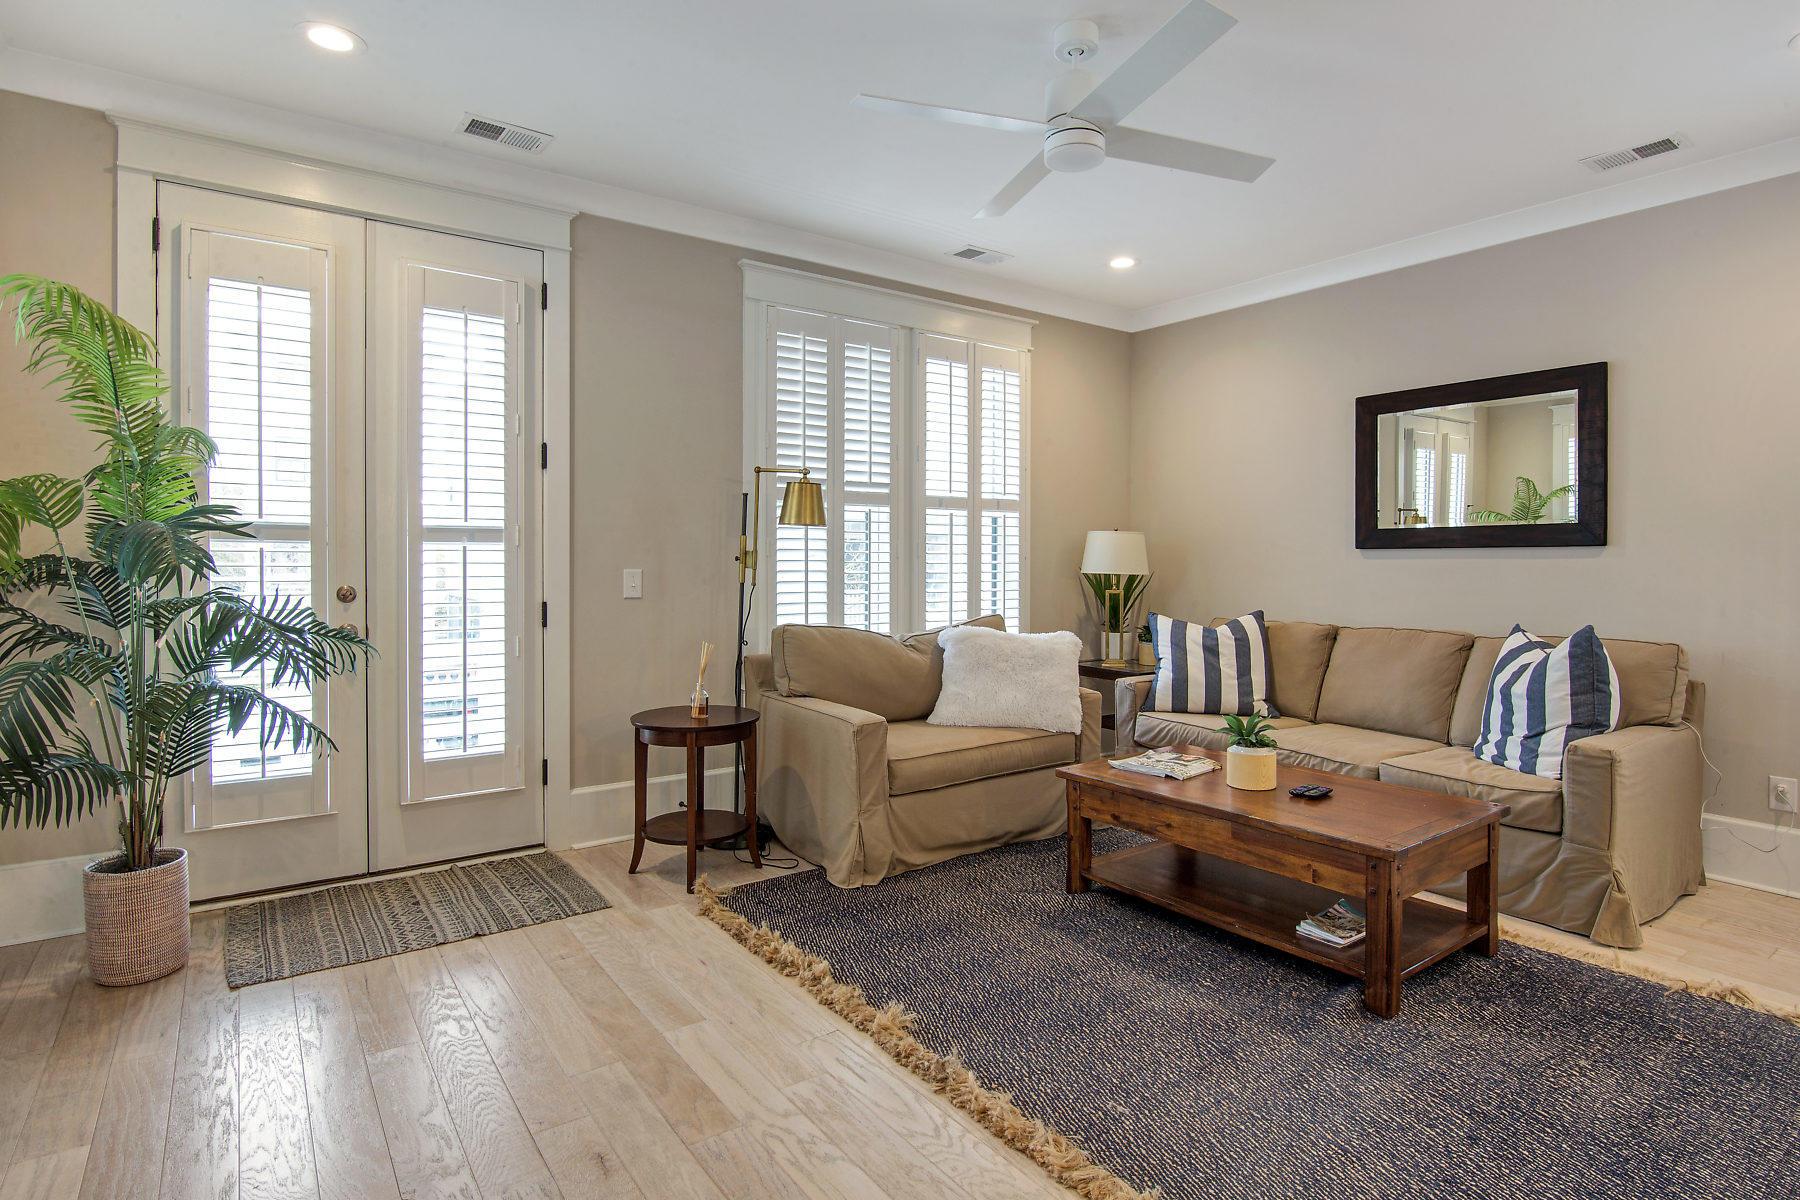 Sullivans Pointe Homes For Sale - 964 Key Colony, Mount Pleasant, SC - 20